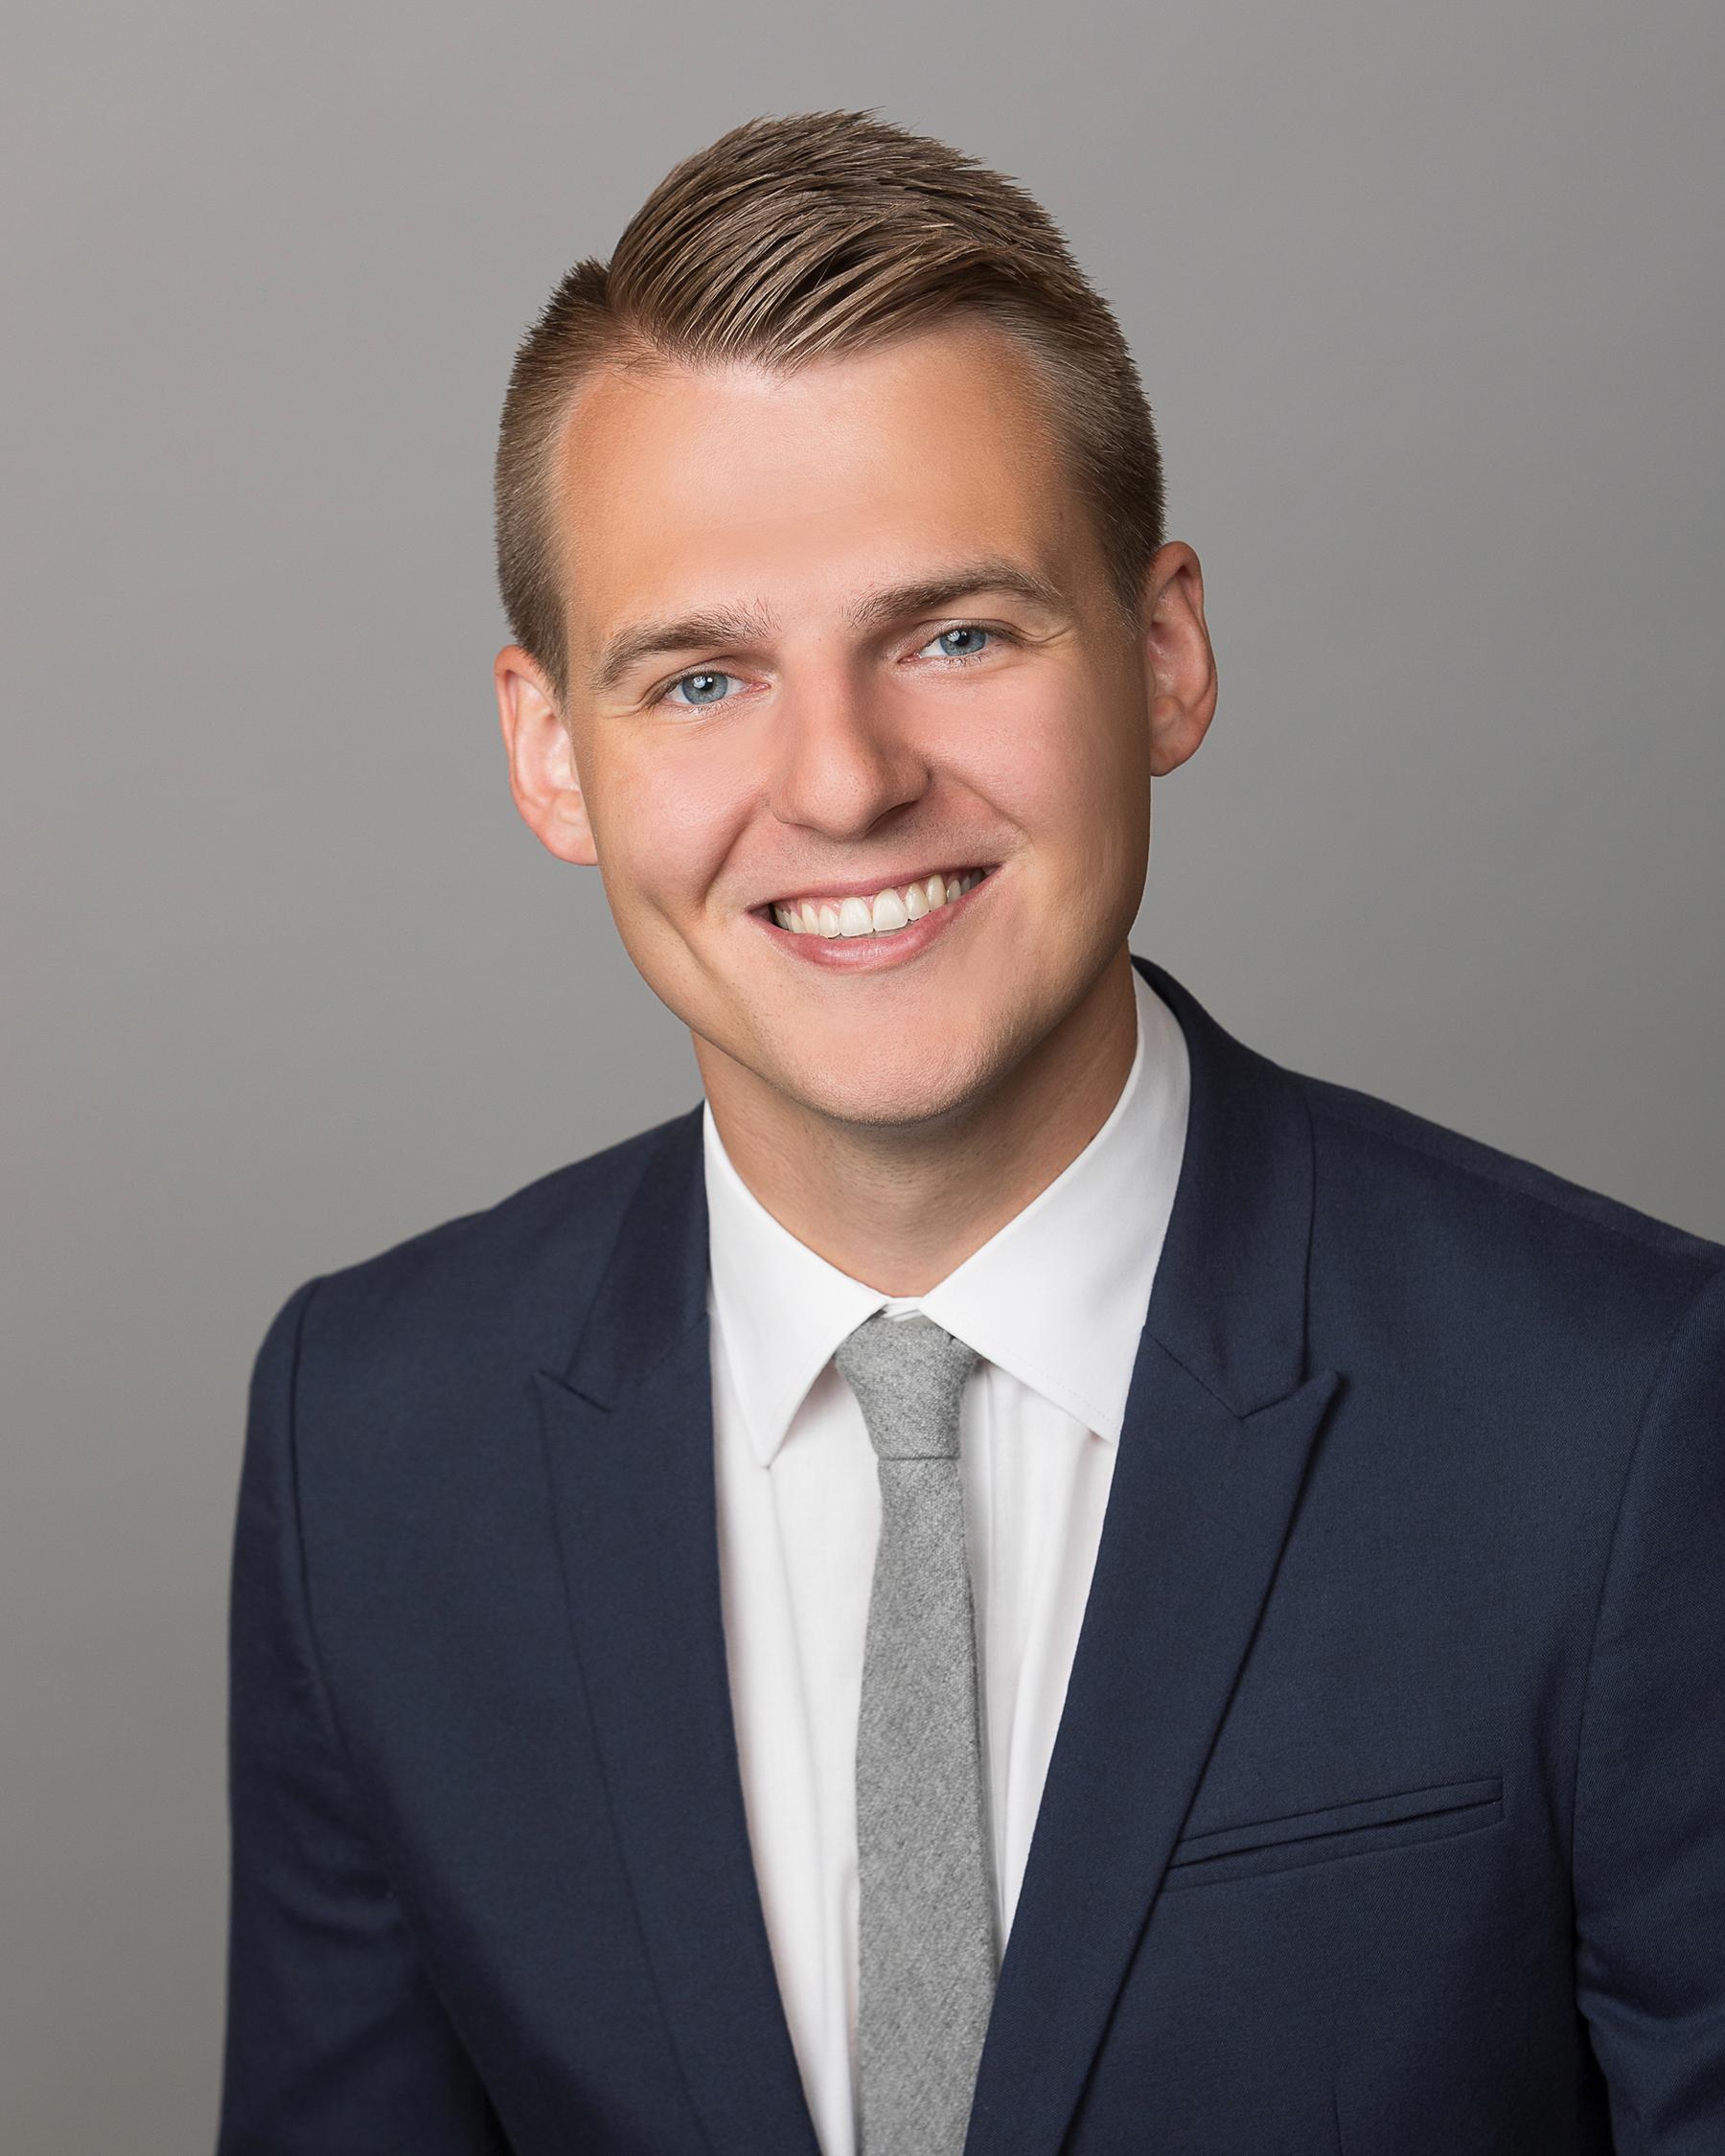 Mason Van Essen